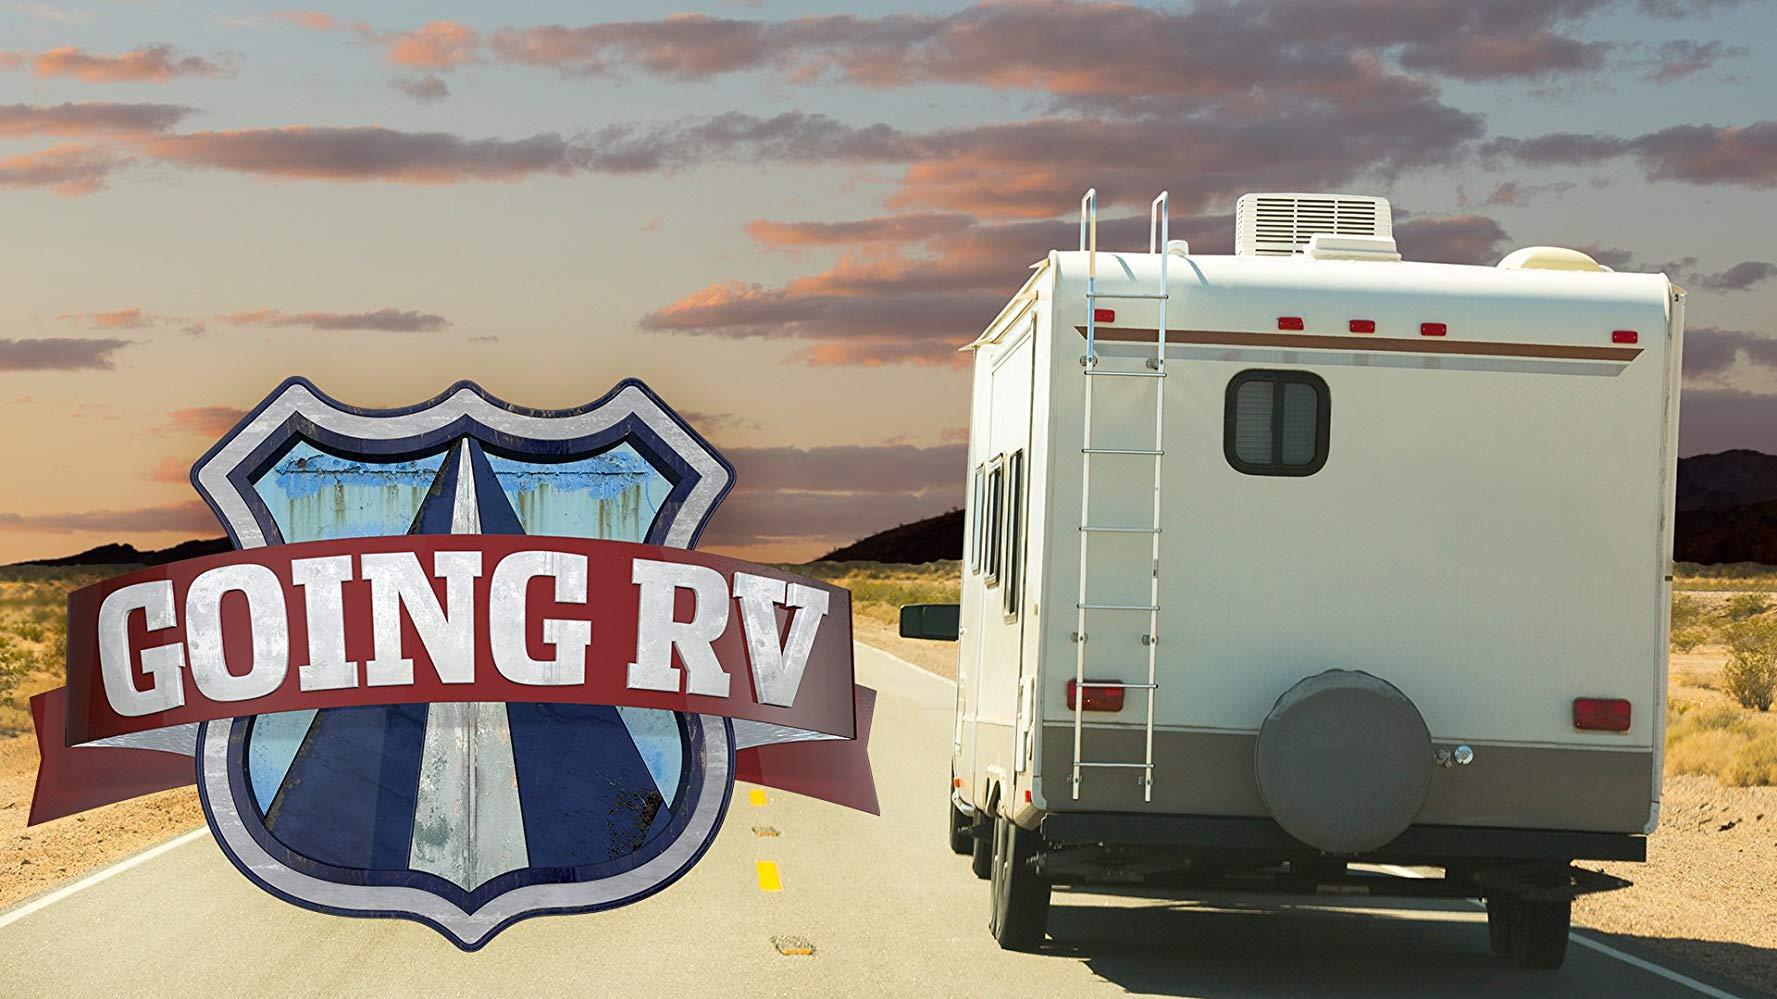 Going RV S01E04 720p HDTV x264-dotTV